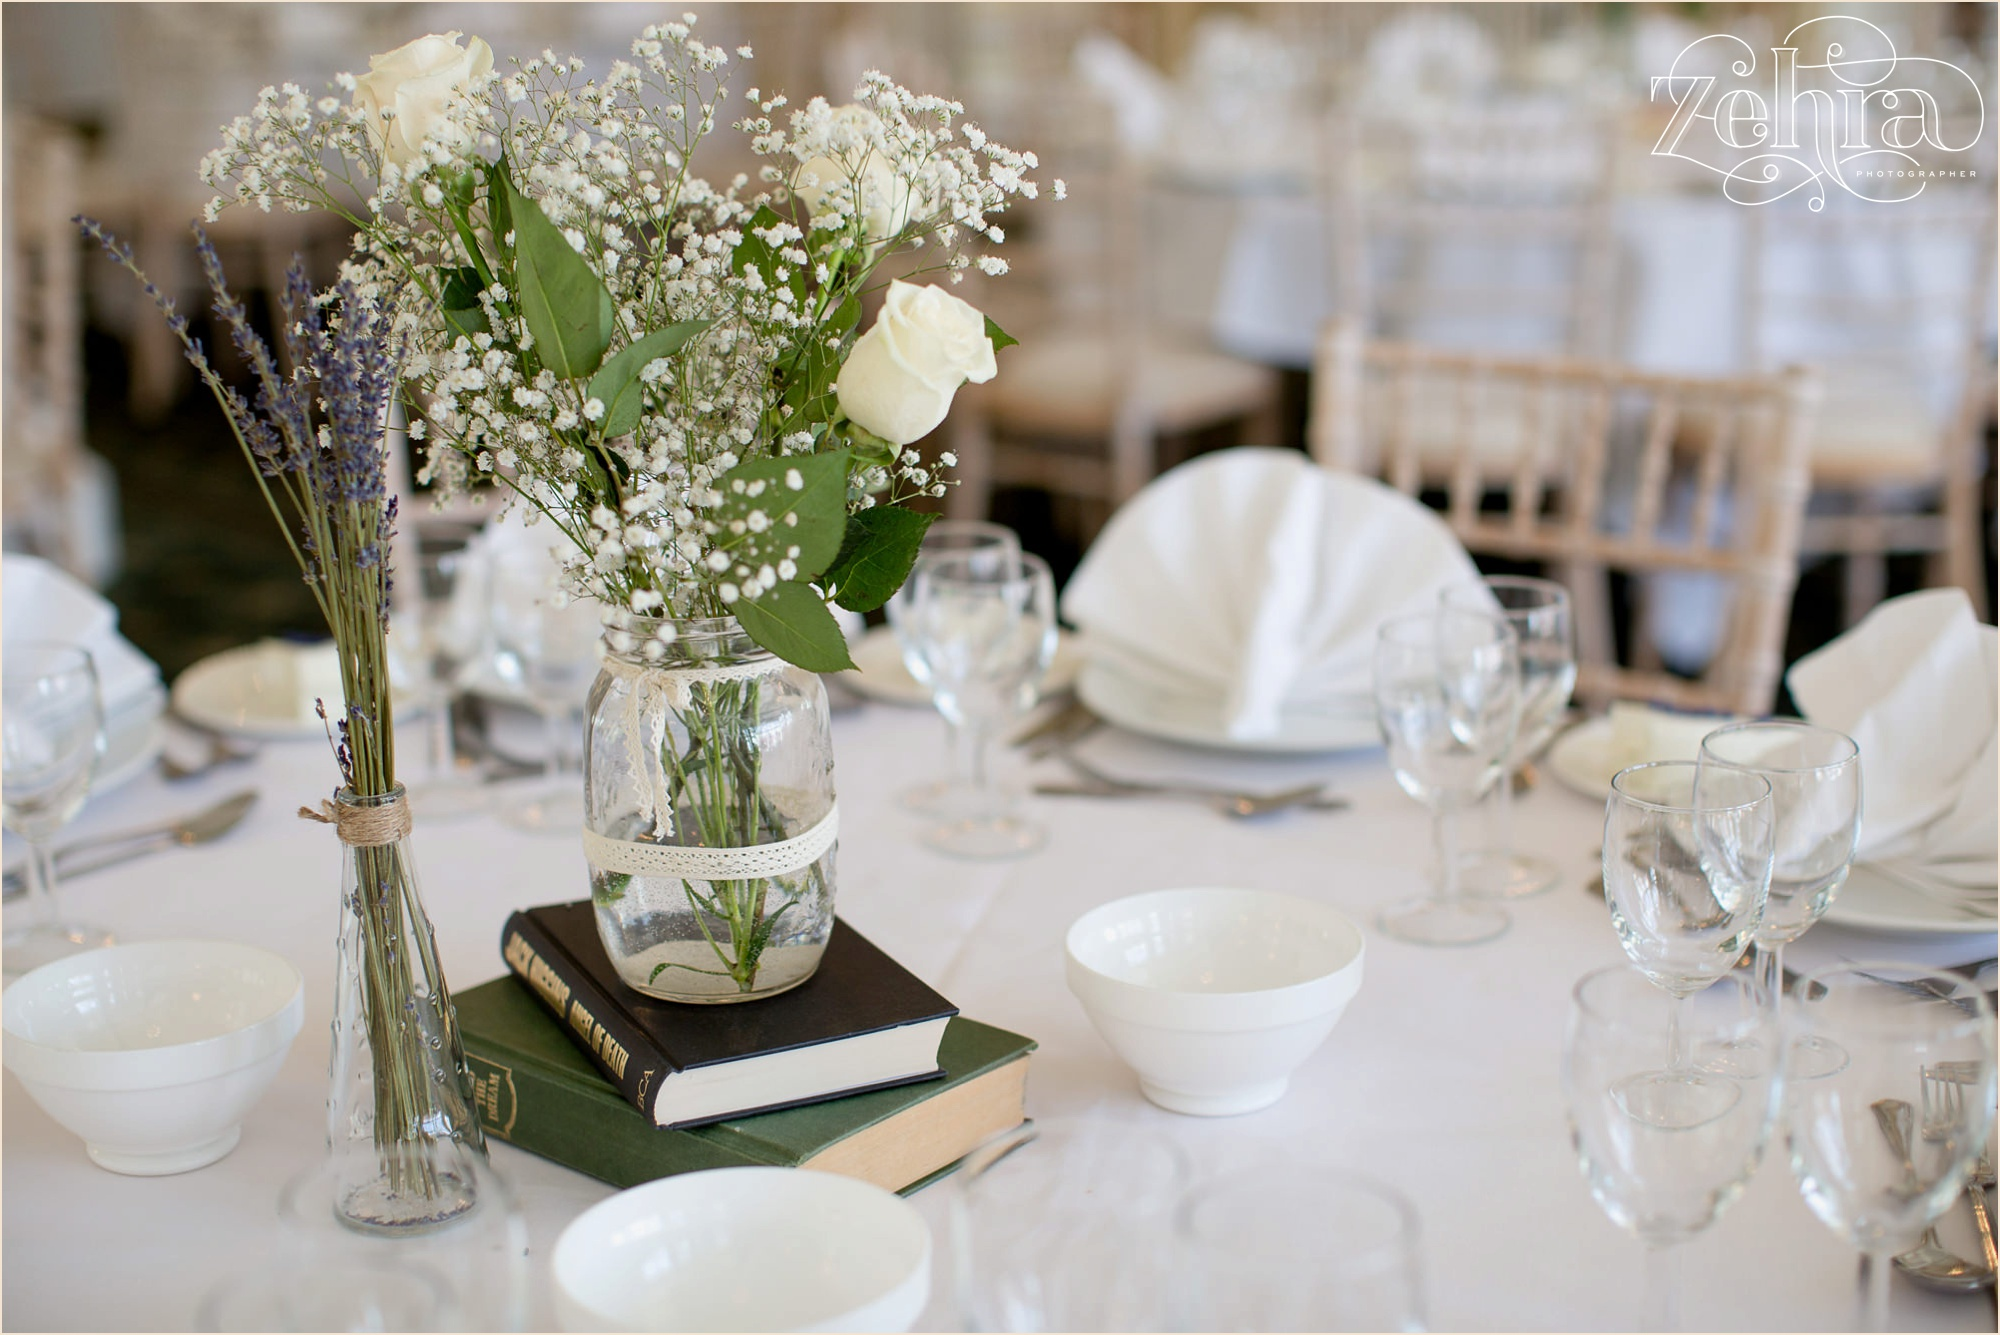 jasira manchester wedding photographer_0050.jpg